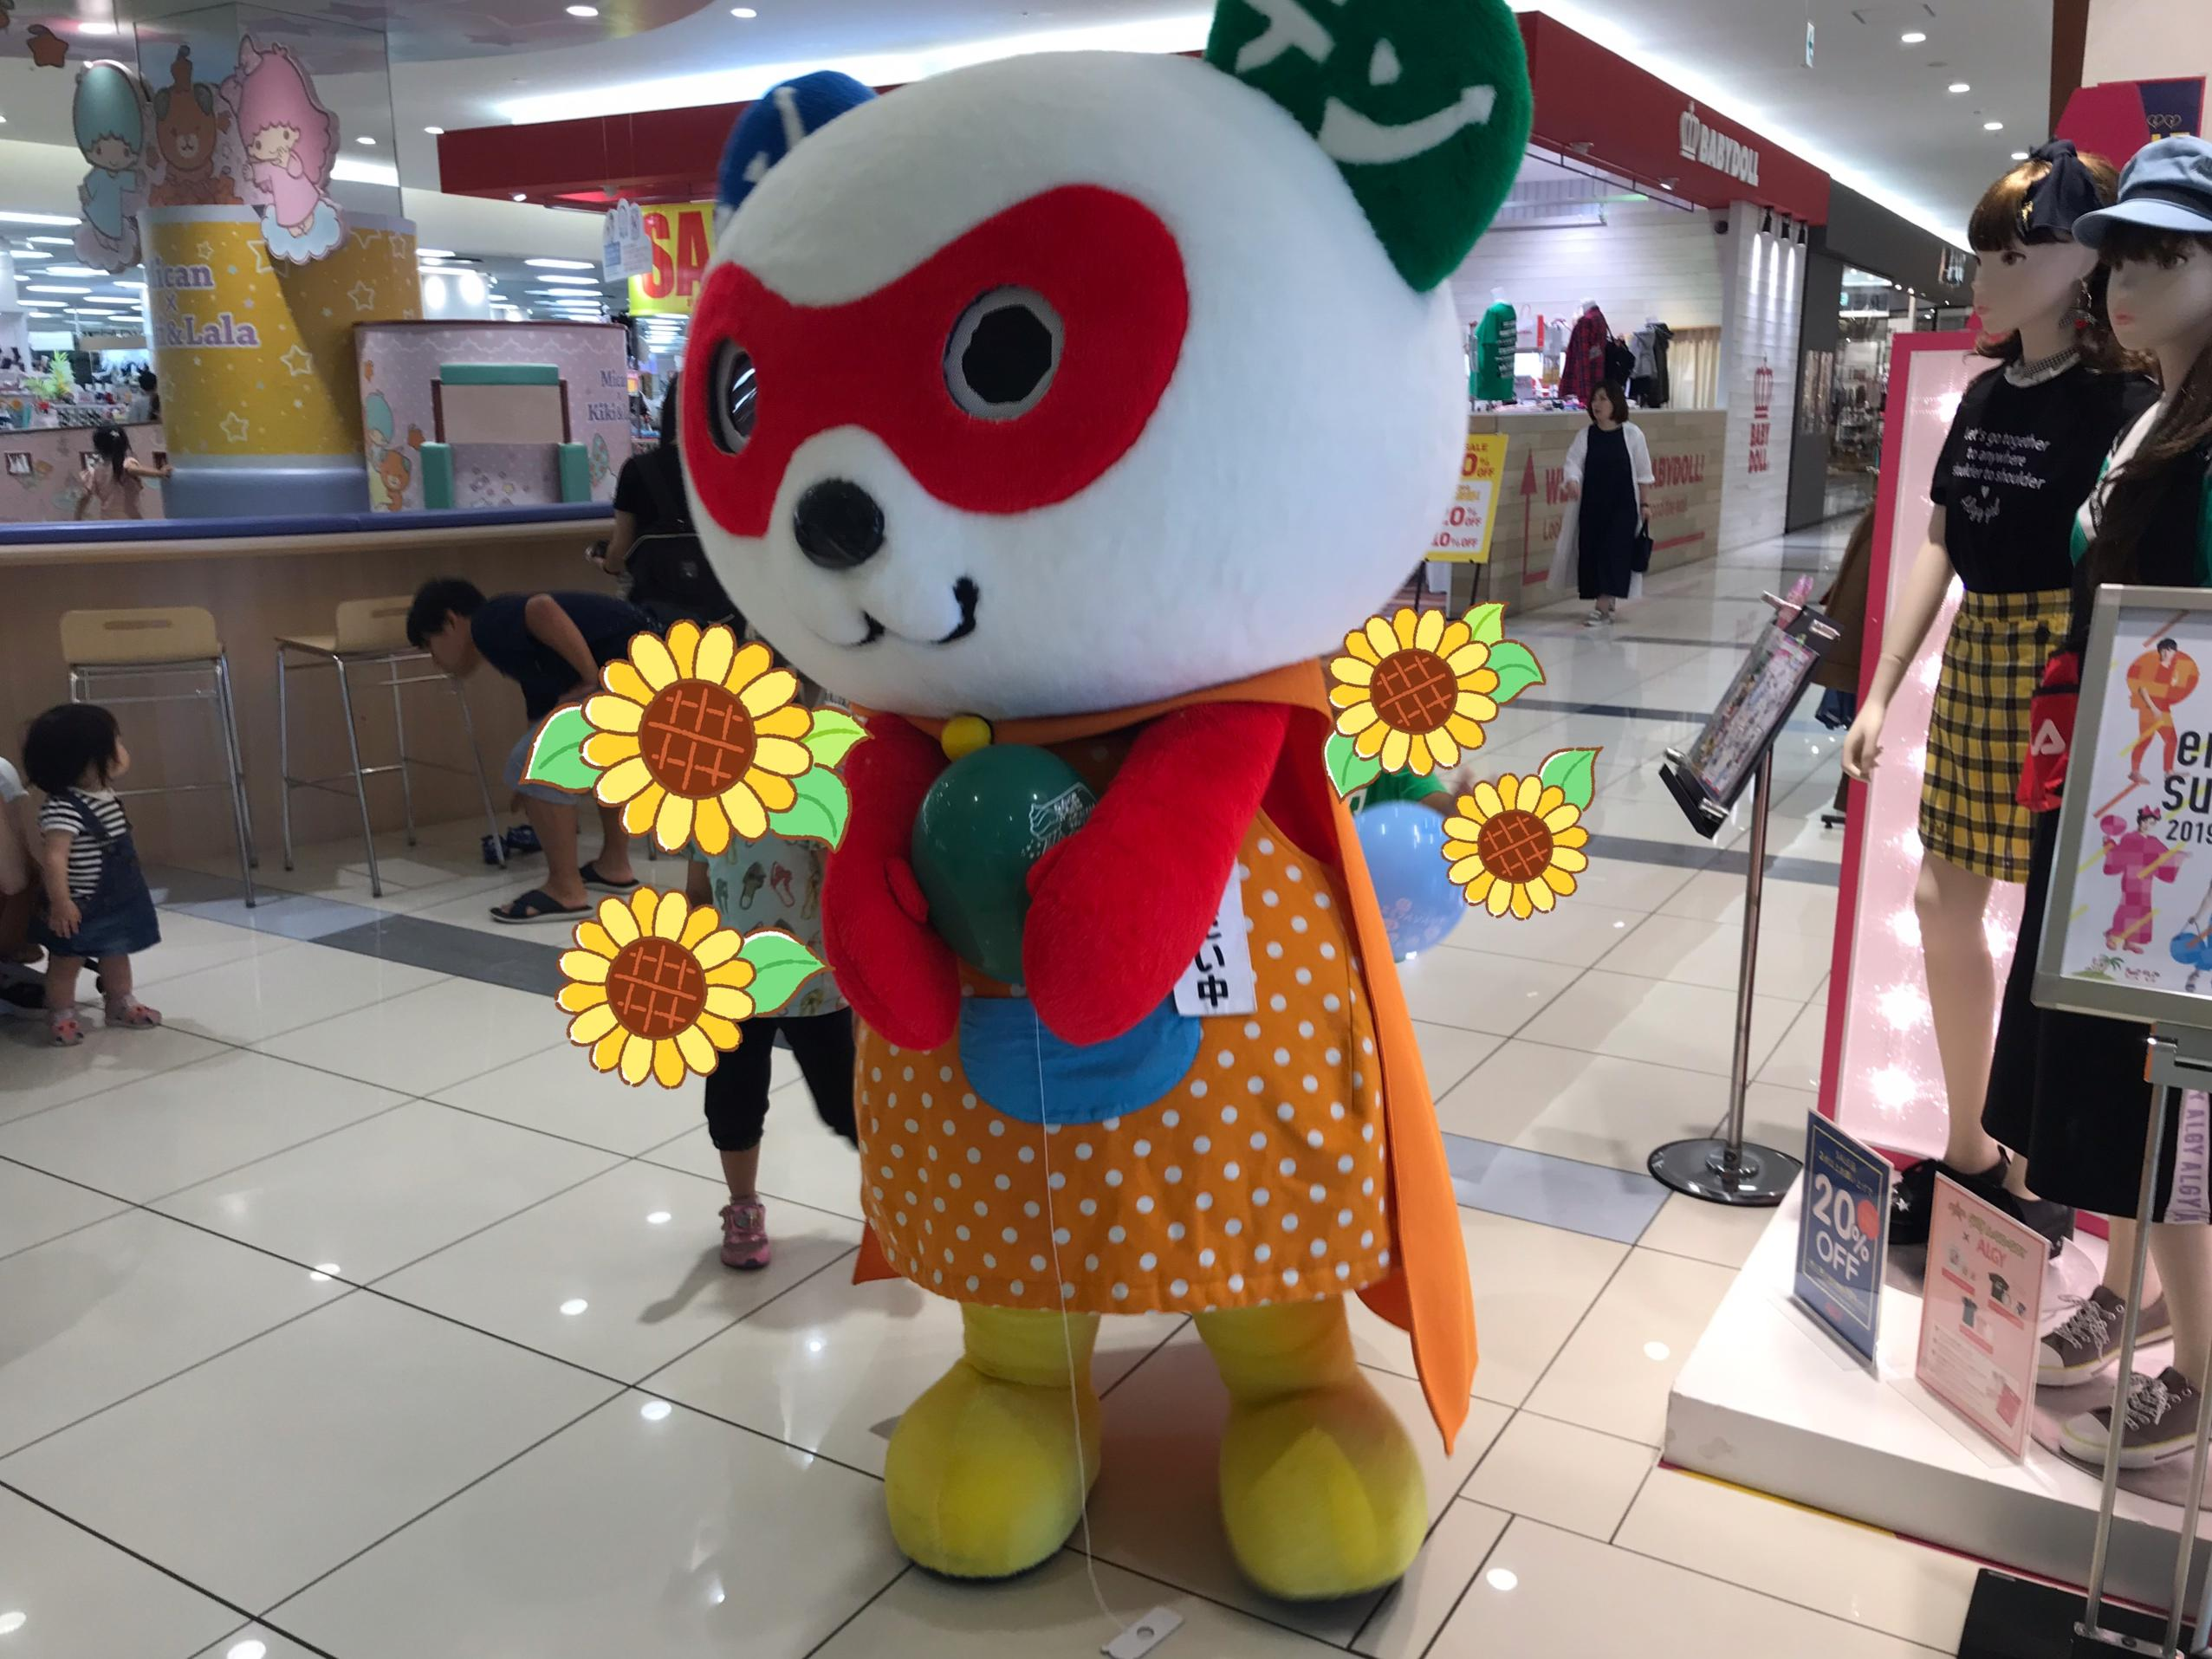 https://emifull.jp/emifulls_blog/12th/2019/08/files/2c9f17716f3166e92c3ae9e6bb2807d450d492d2.JPG